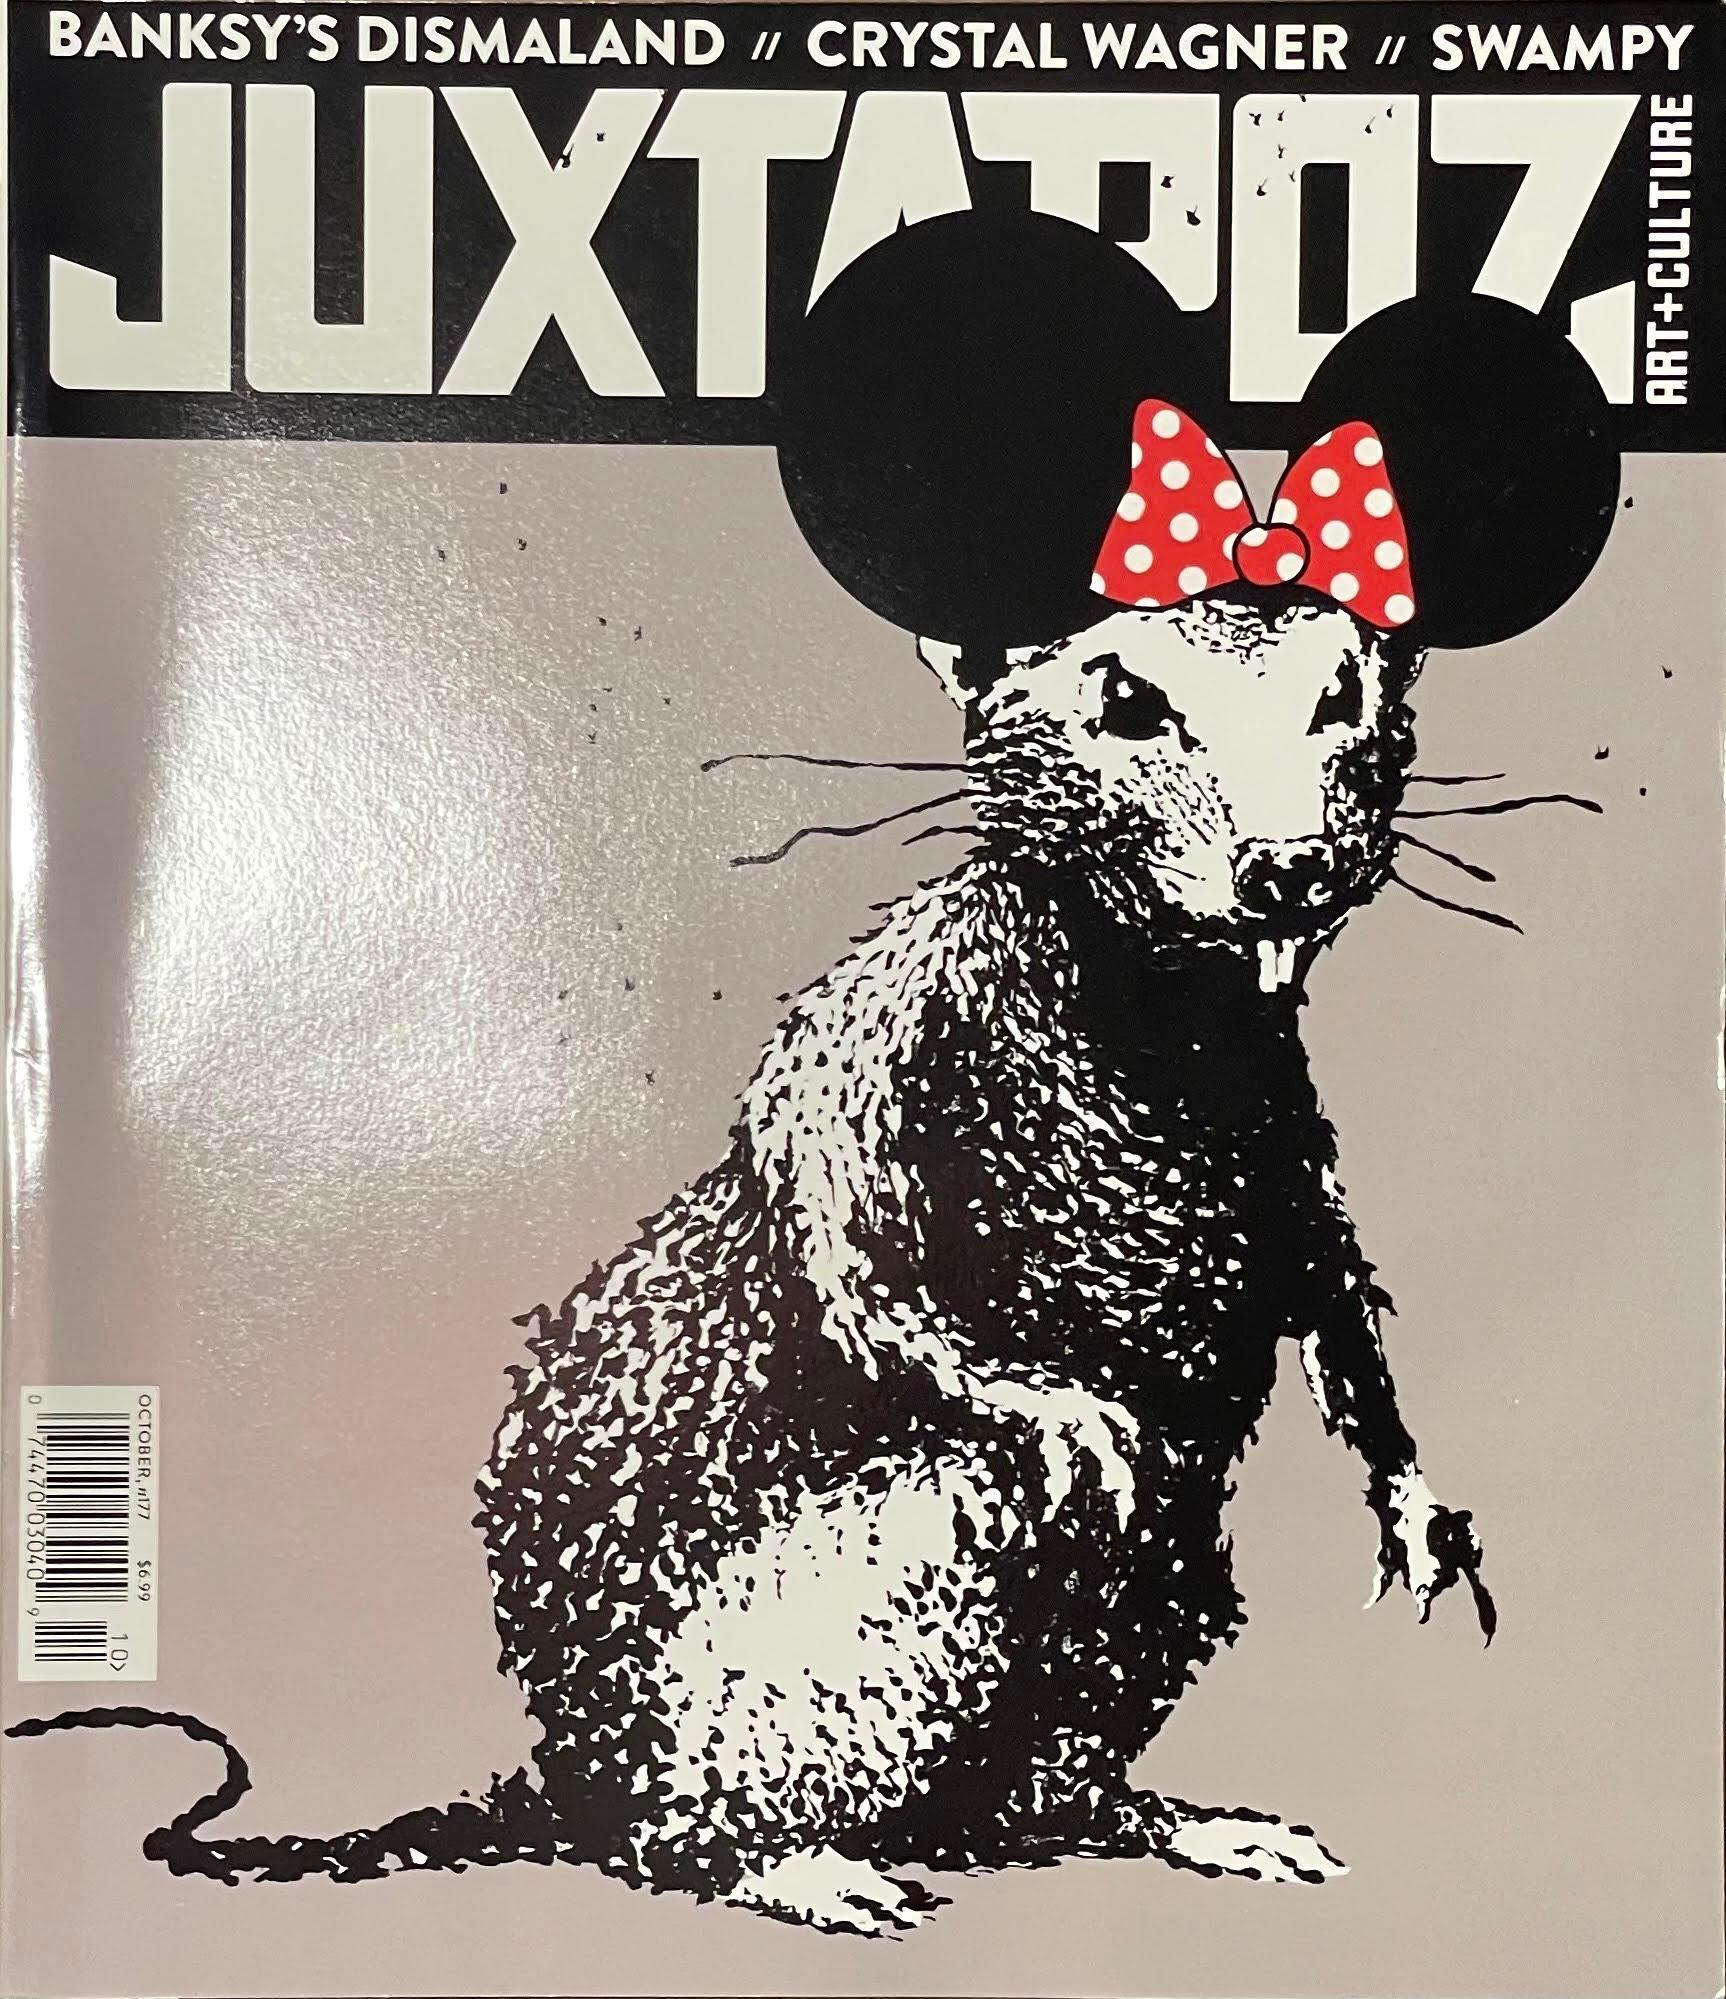 Banksy Juxtapose Magazine DIsmaland 2015 Original Copy Cyrstal Wagner Interview